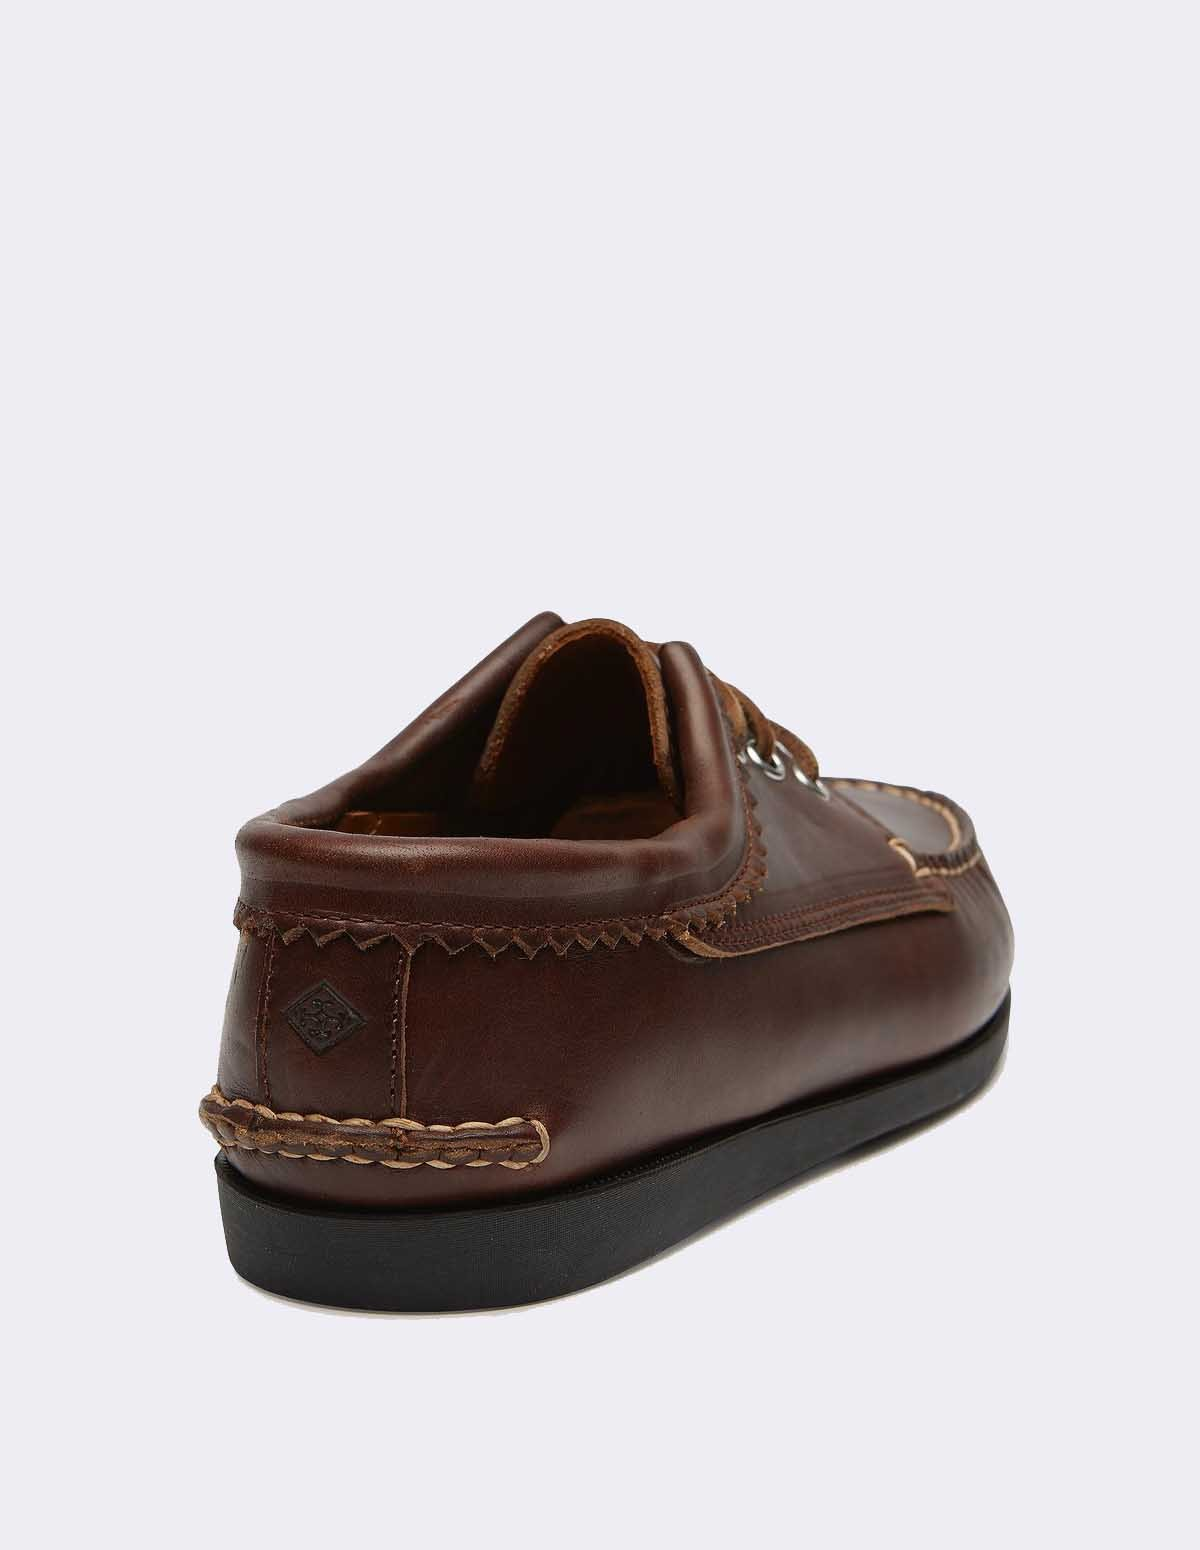 Quoddy Blutcher Leather